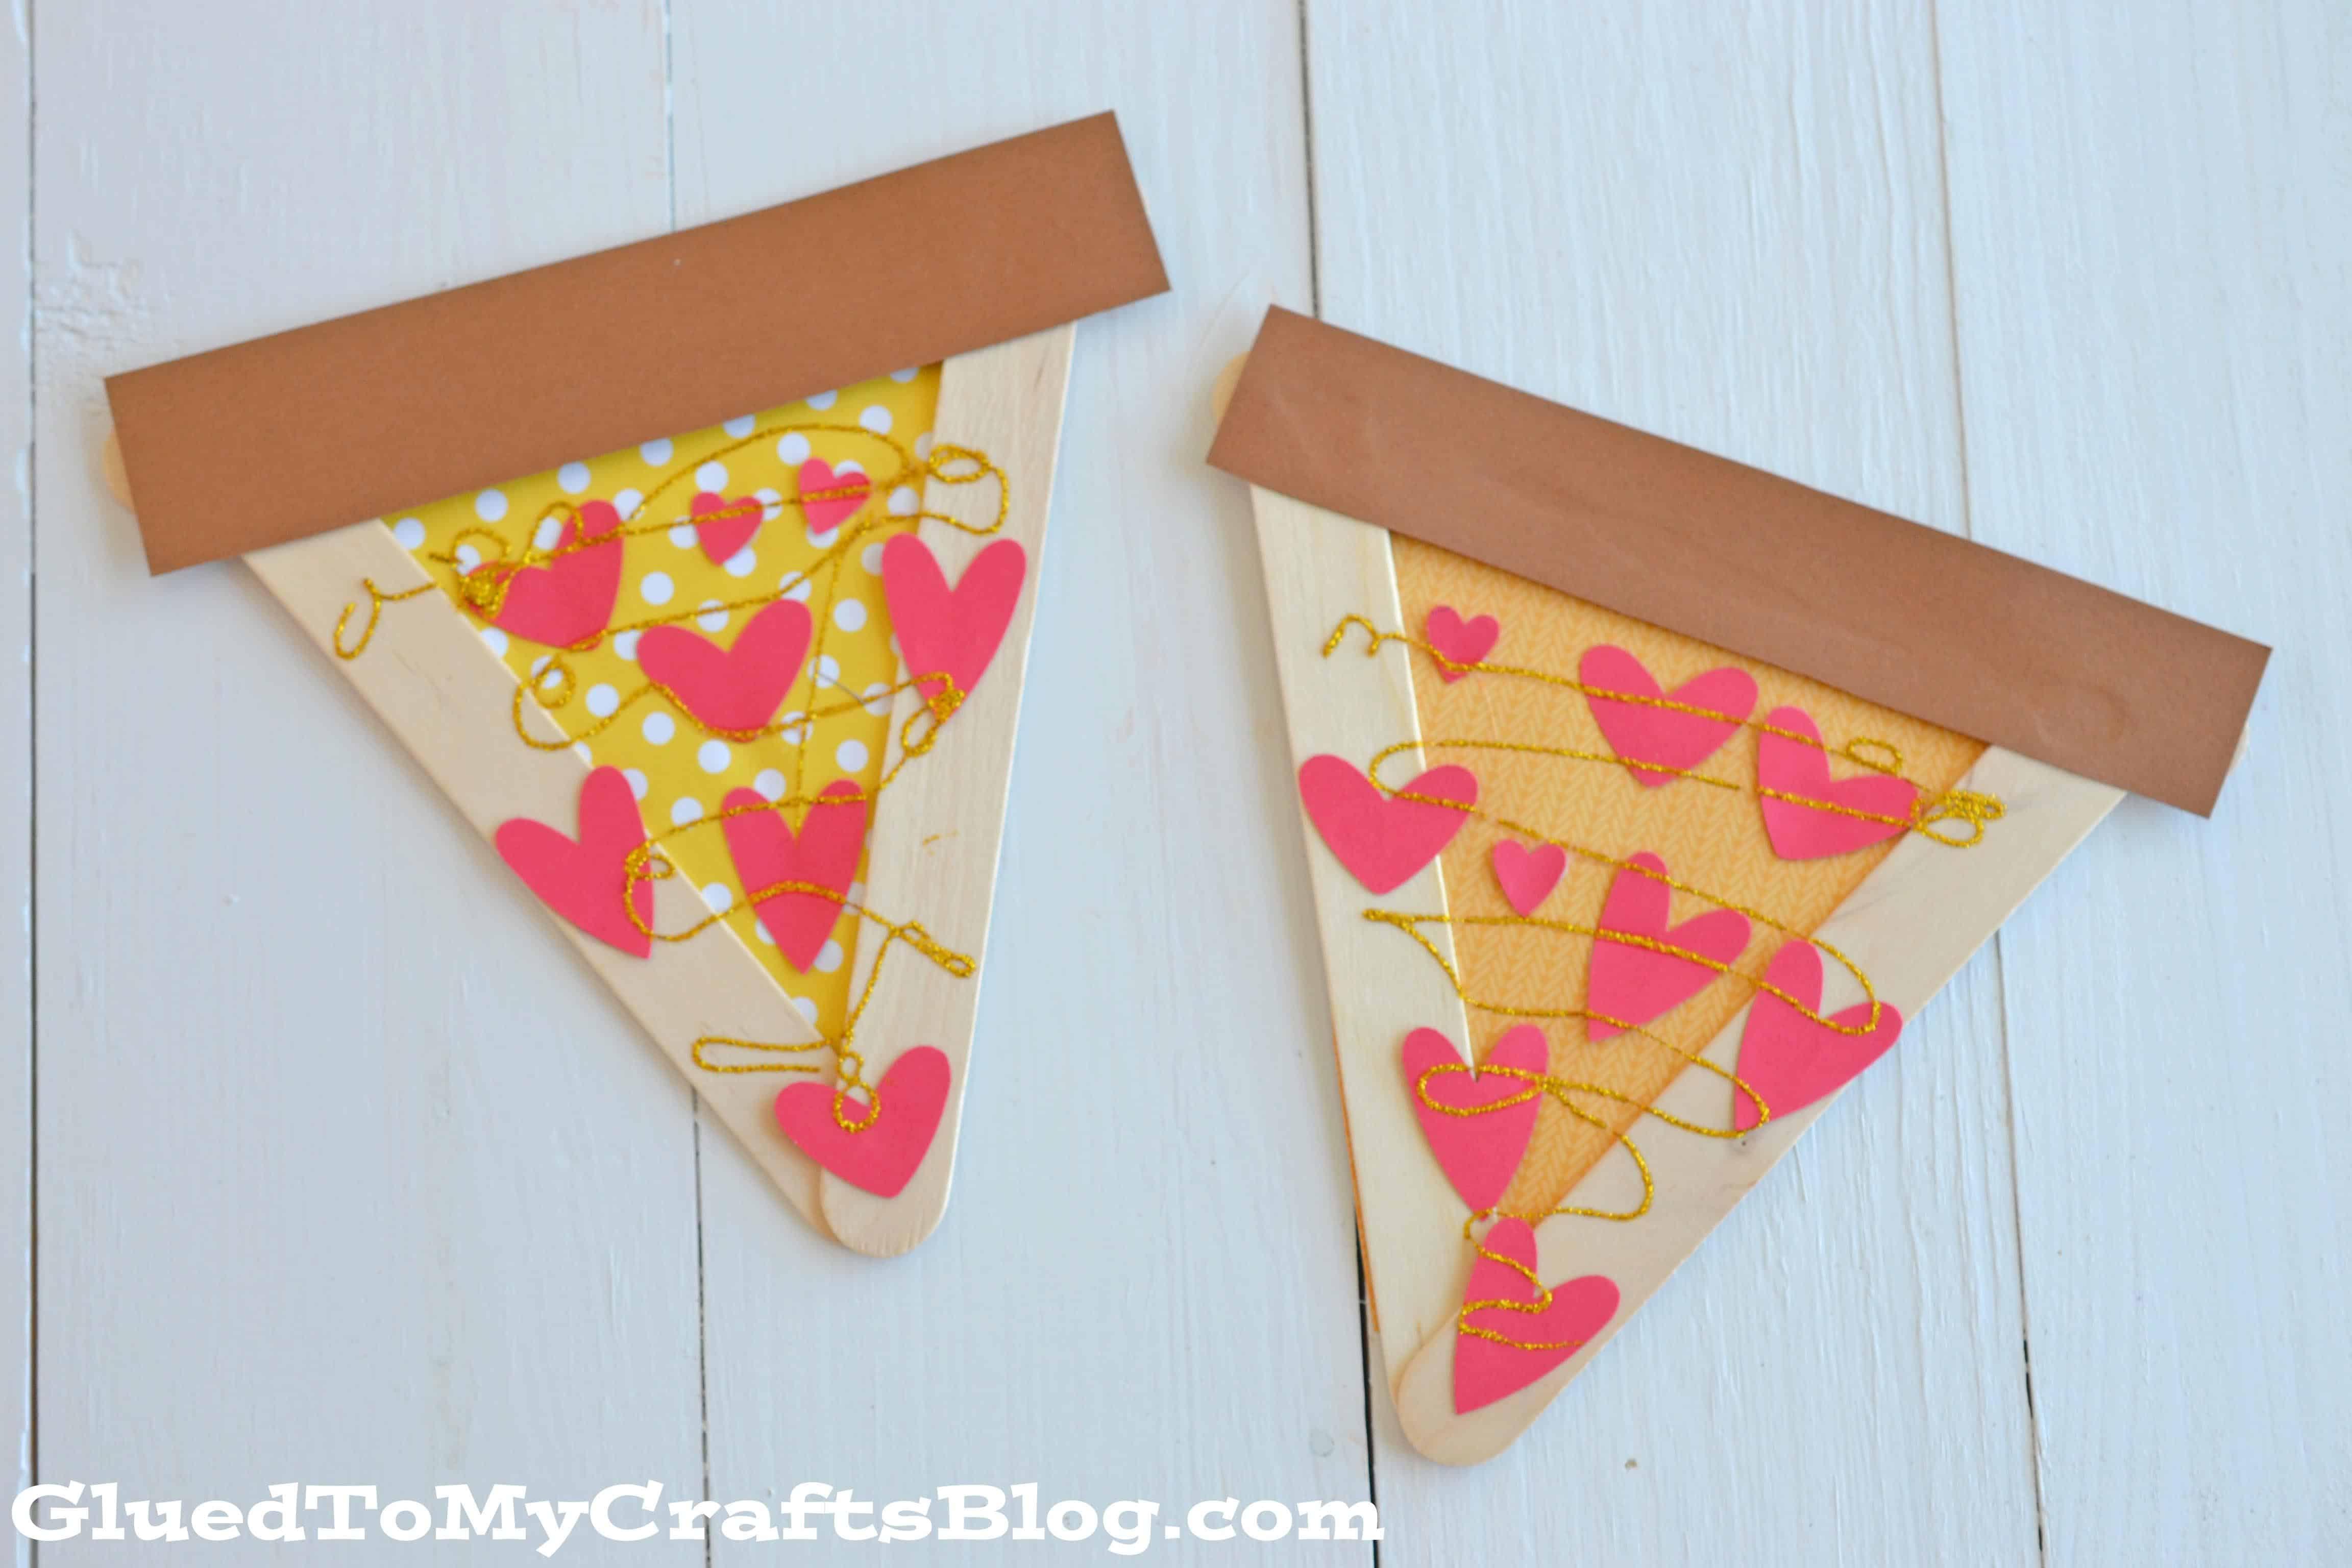 Popsicle stick pizza